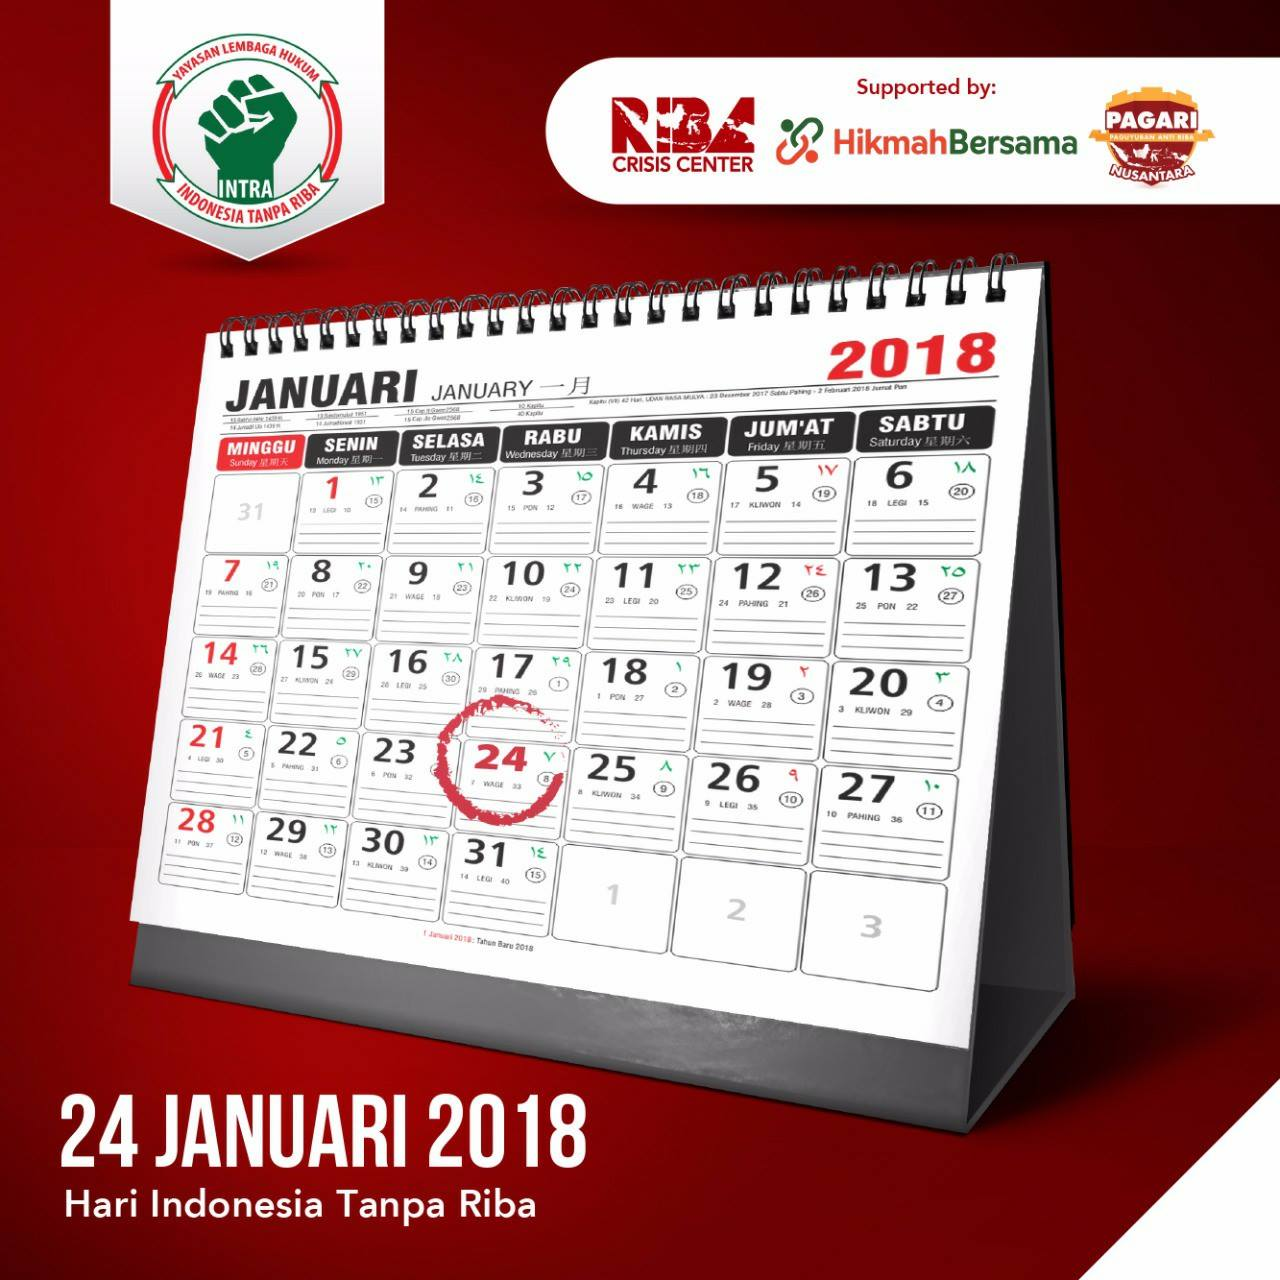 Jelang Hari Indonesia Tanpa RIBA 2018